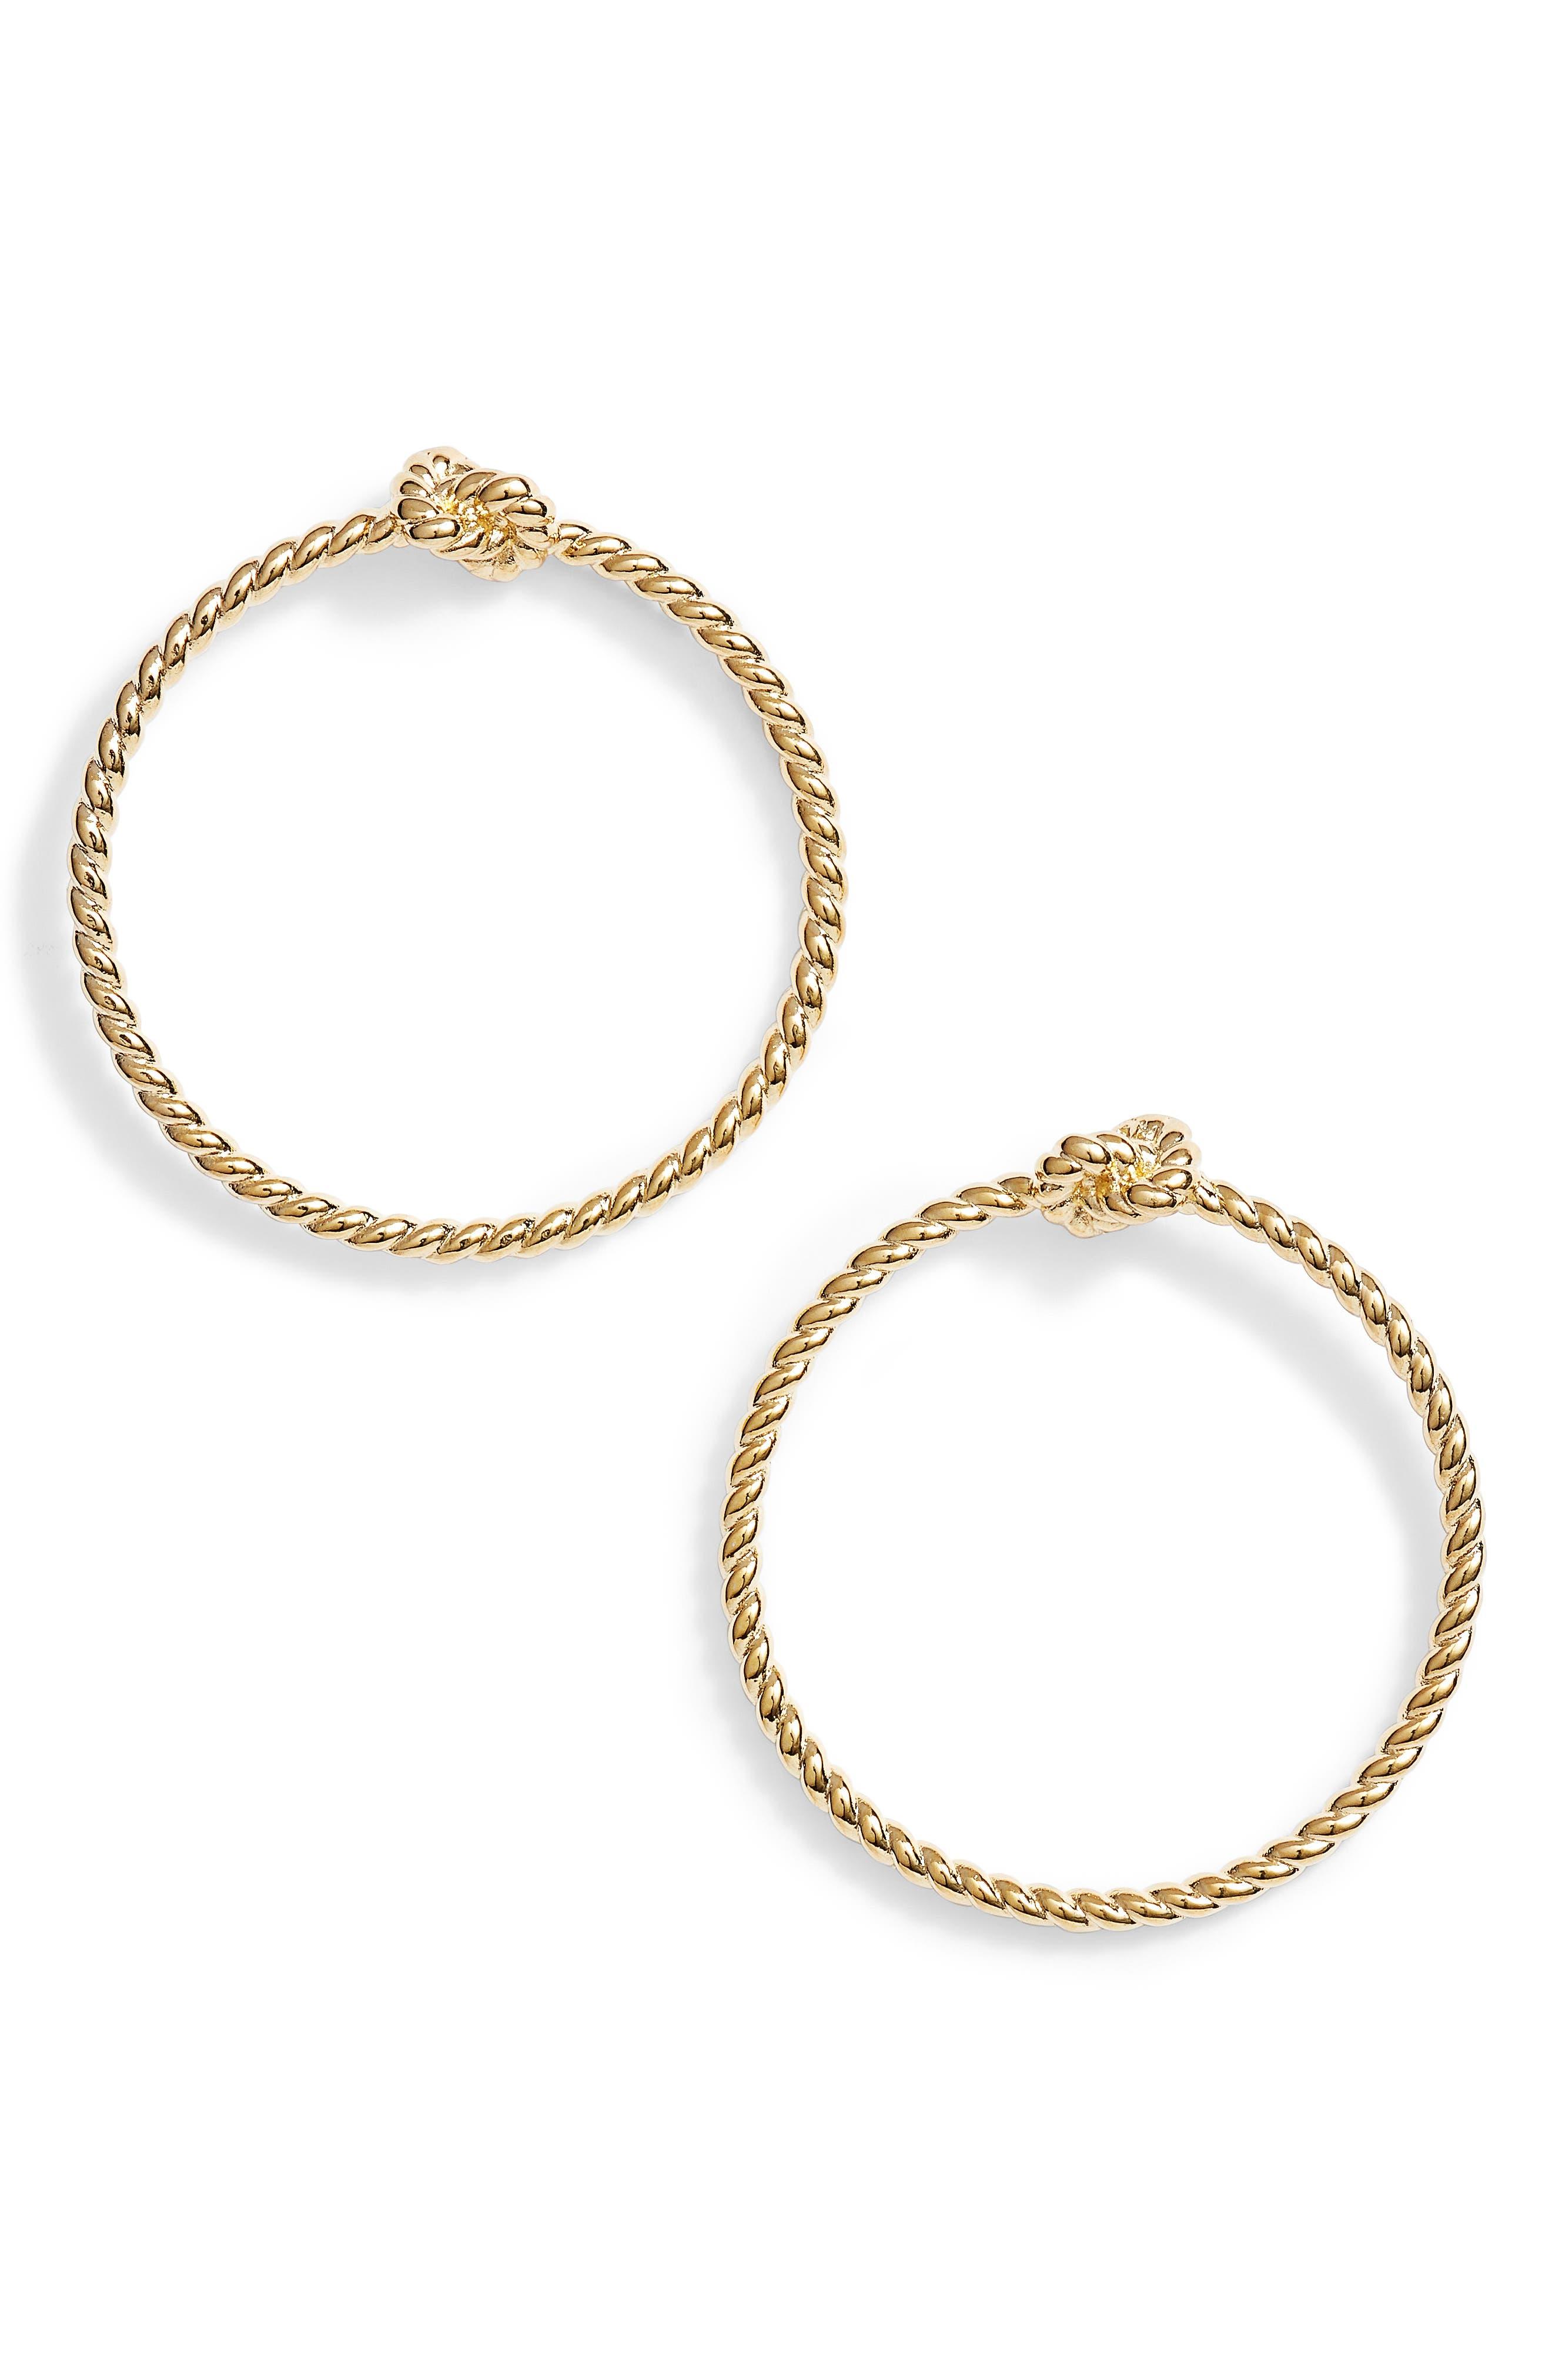 sailor knot door knocker hoop earrings,                             Main thumbnail 1, color,                             Gold